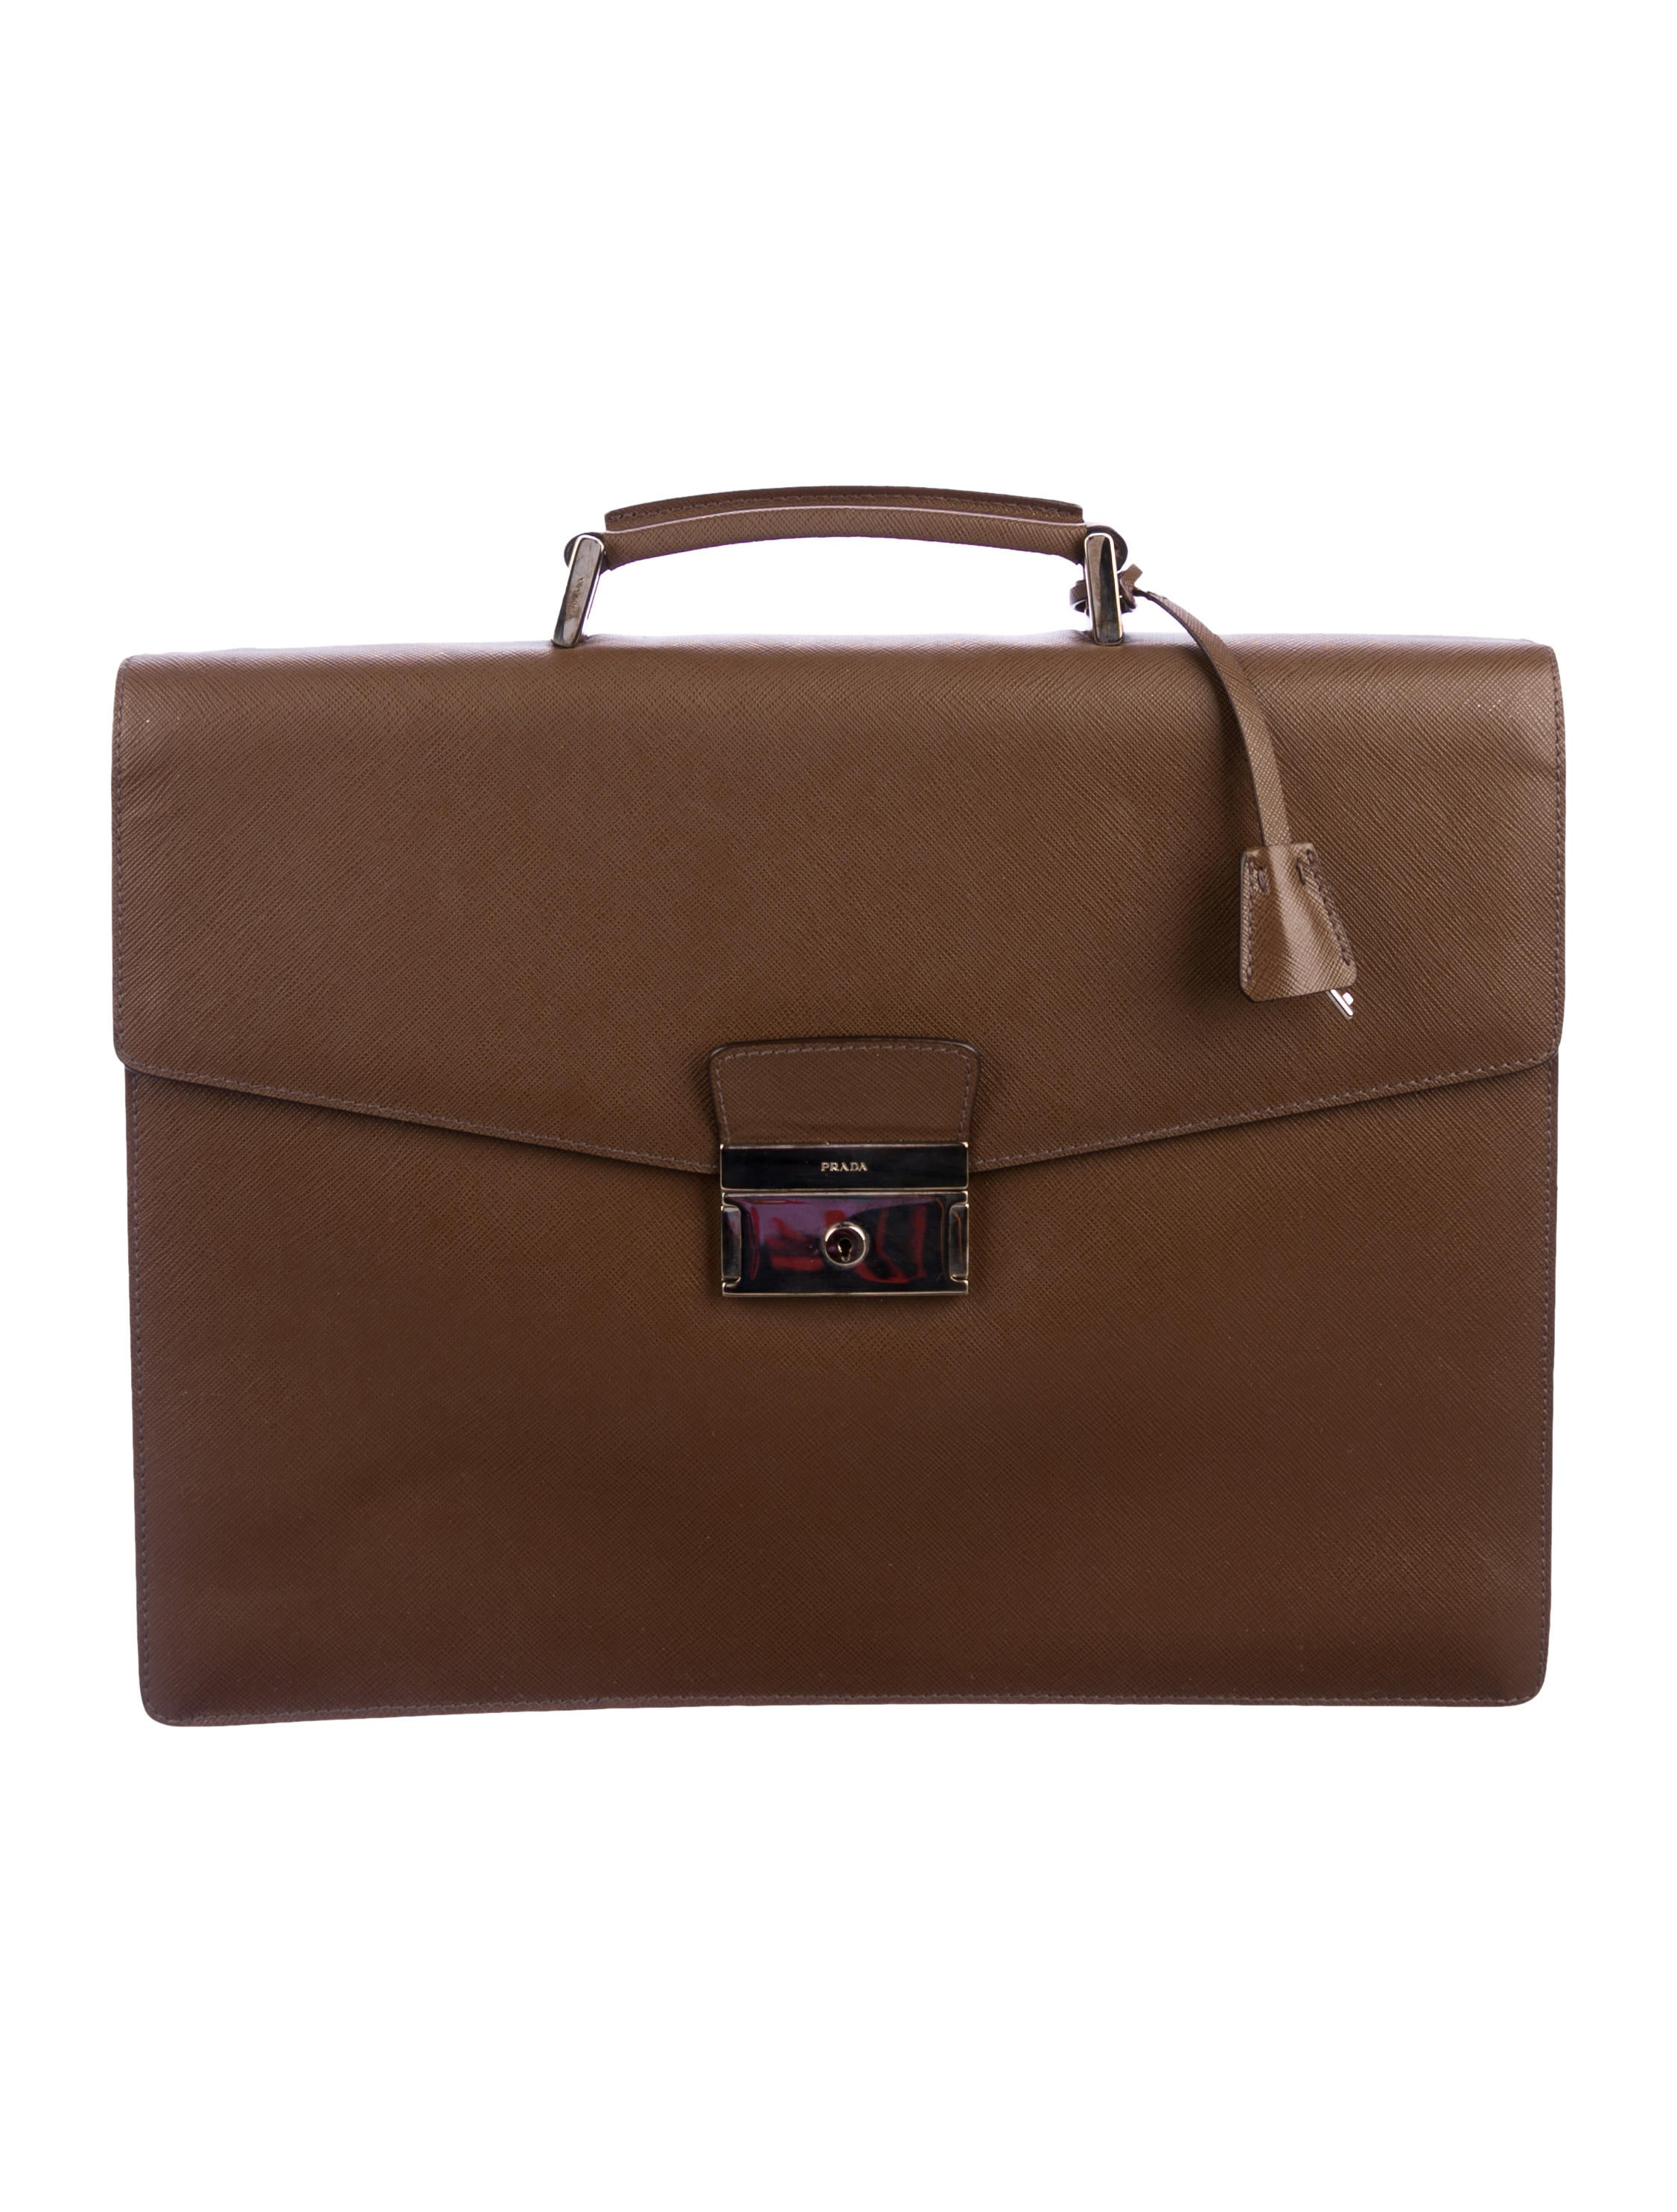 Prada Saffiano Leather Flap Briefcase - Bags - PRA269437  5831ccbe0695c